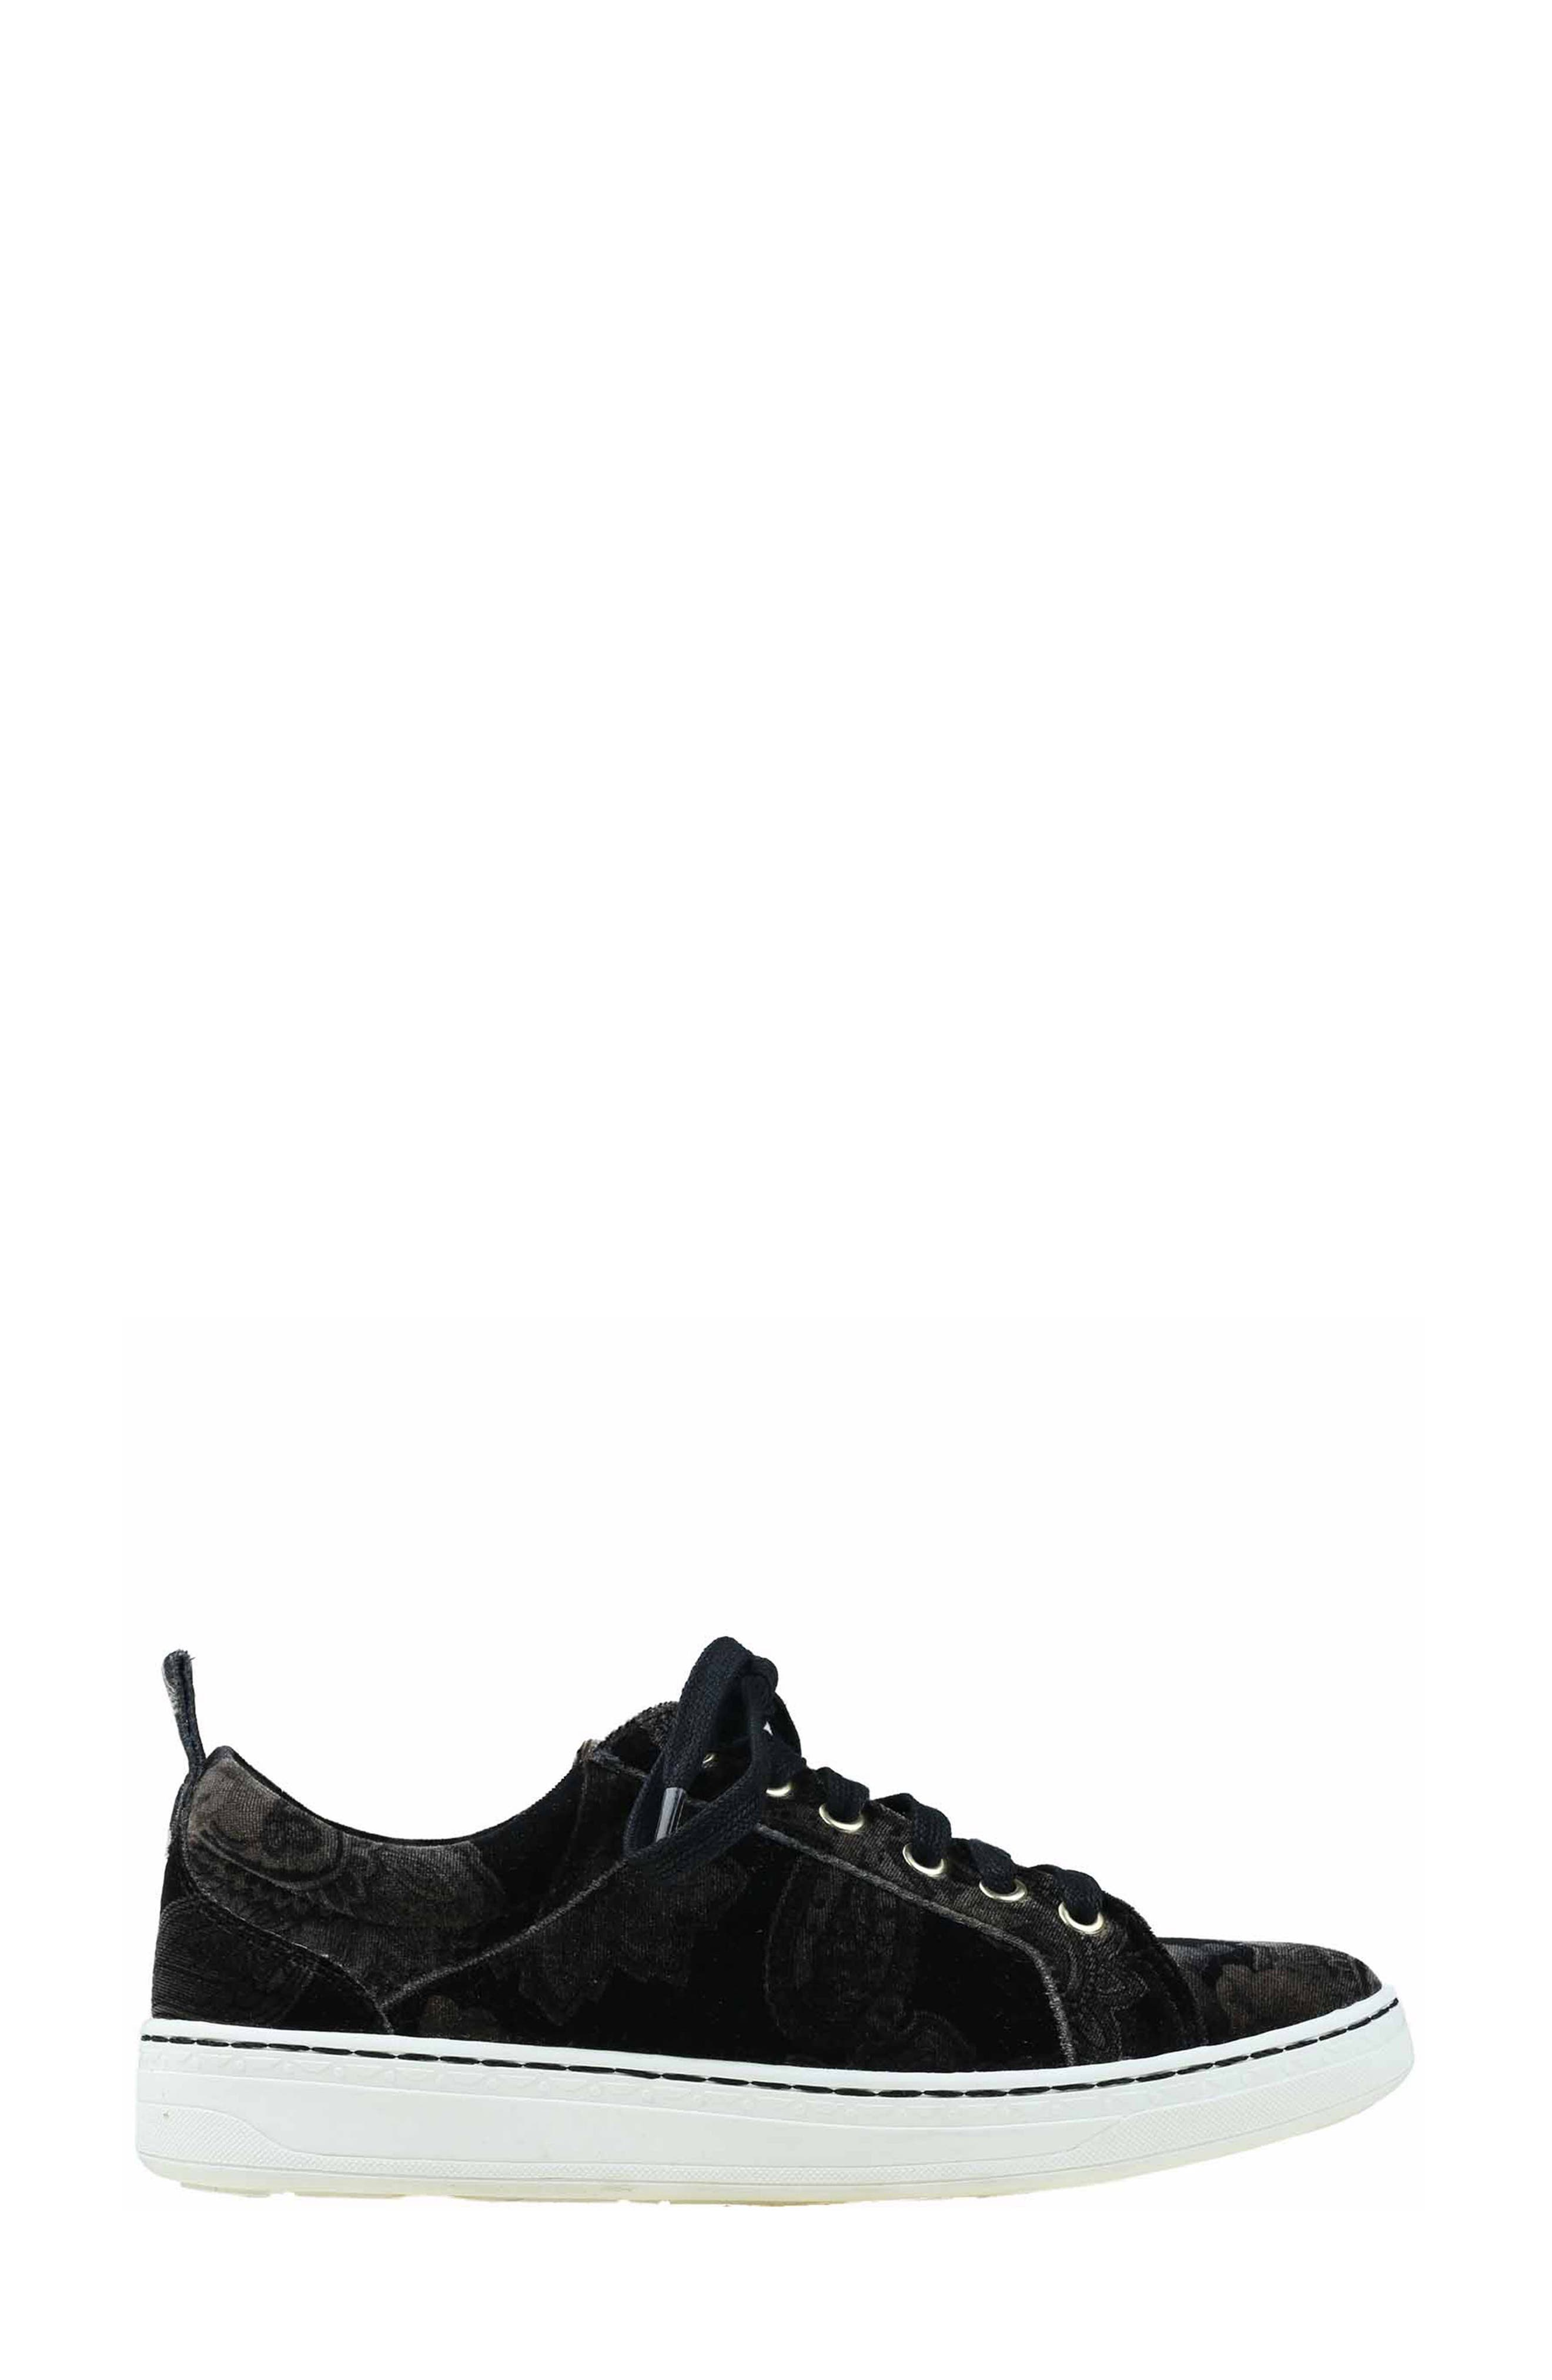 Zag Sneaker,                             Alternate thumbnail 18, color,